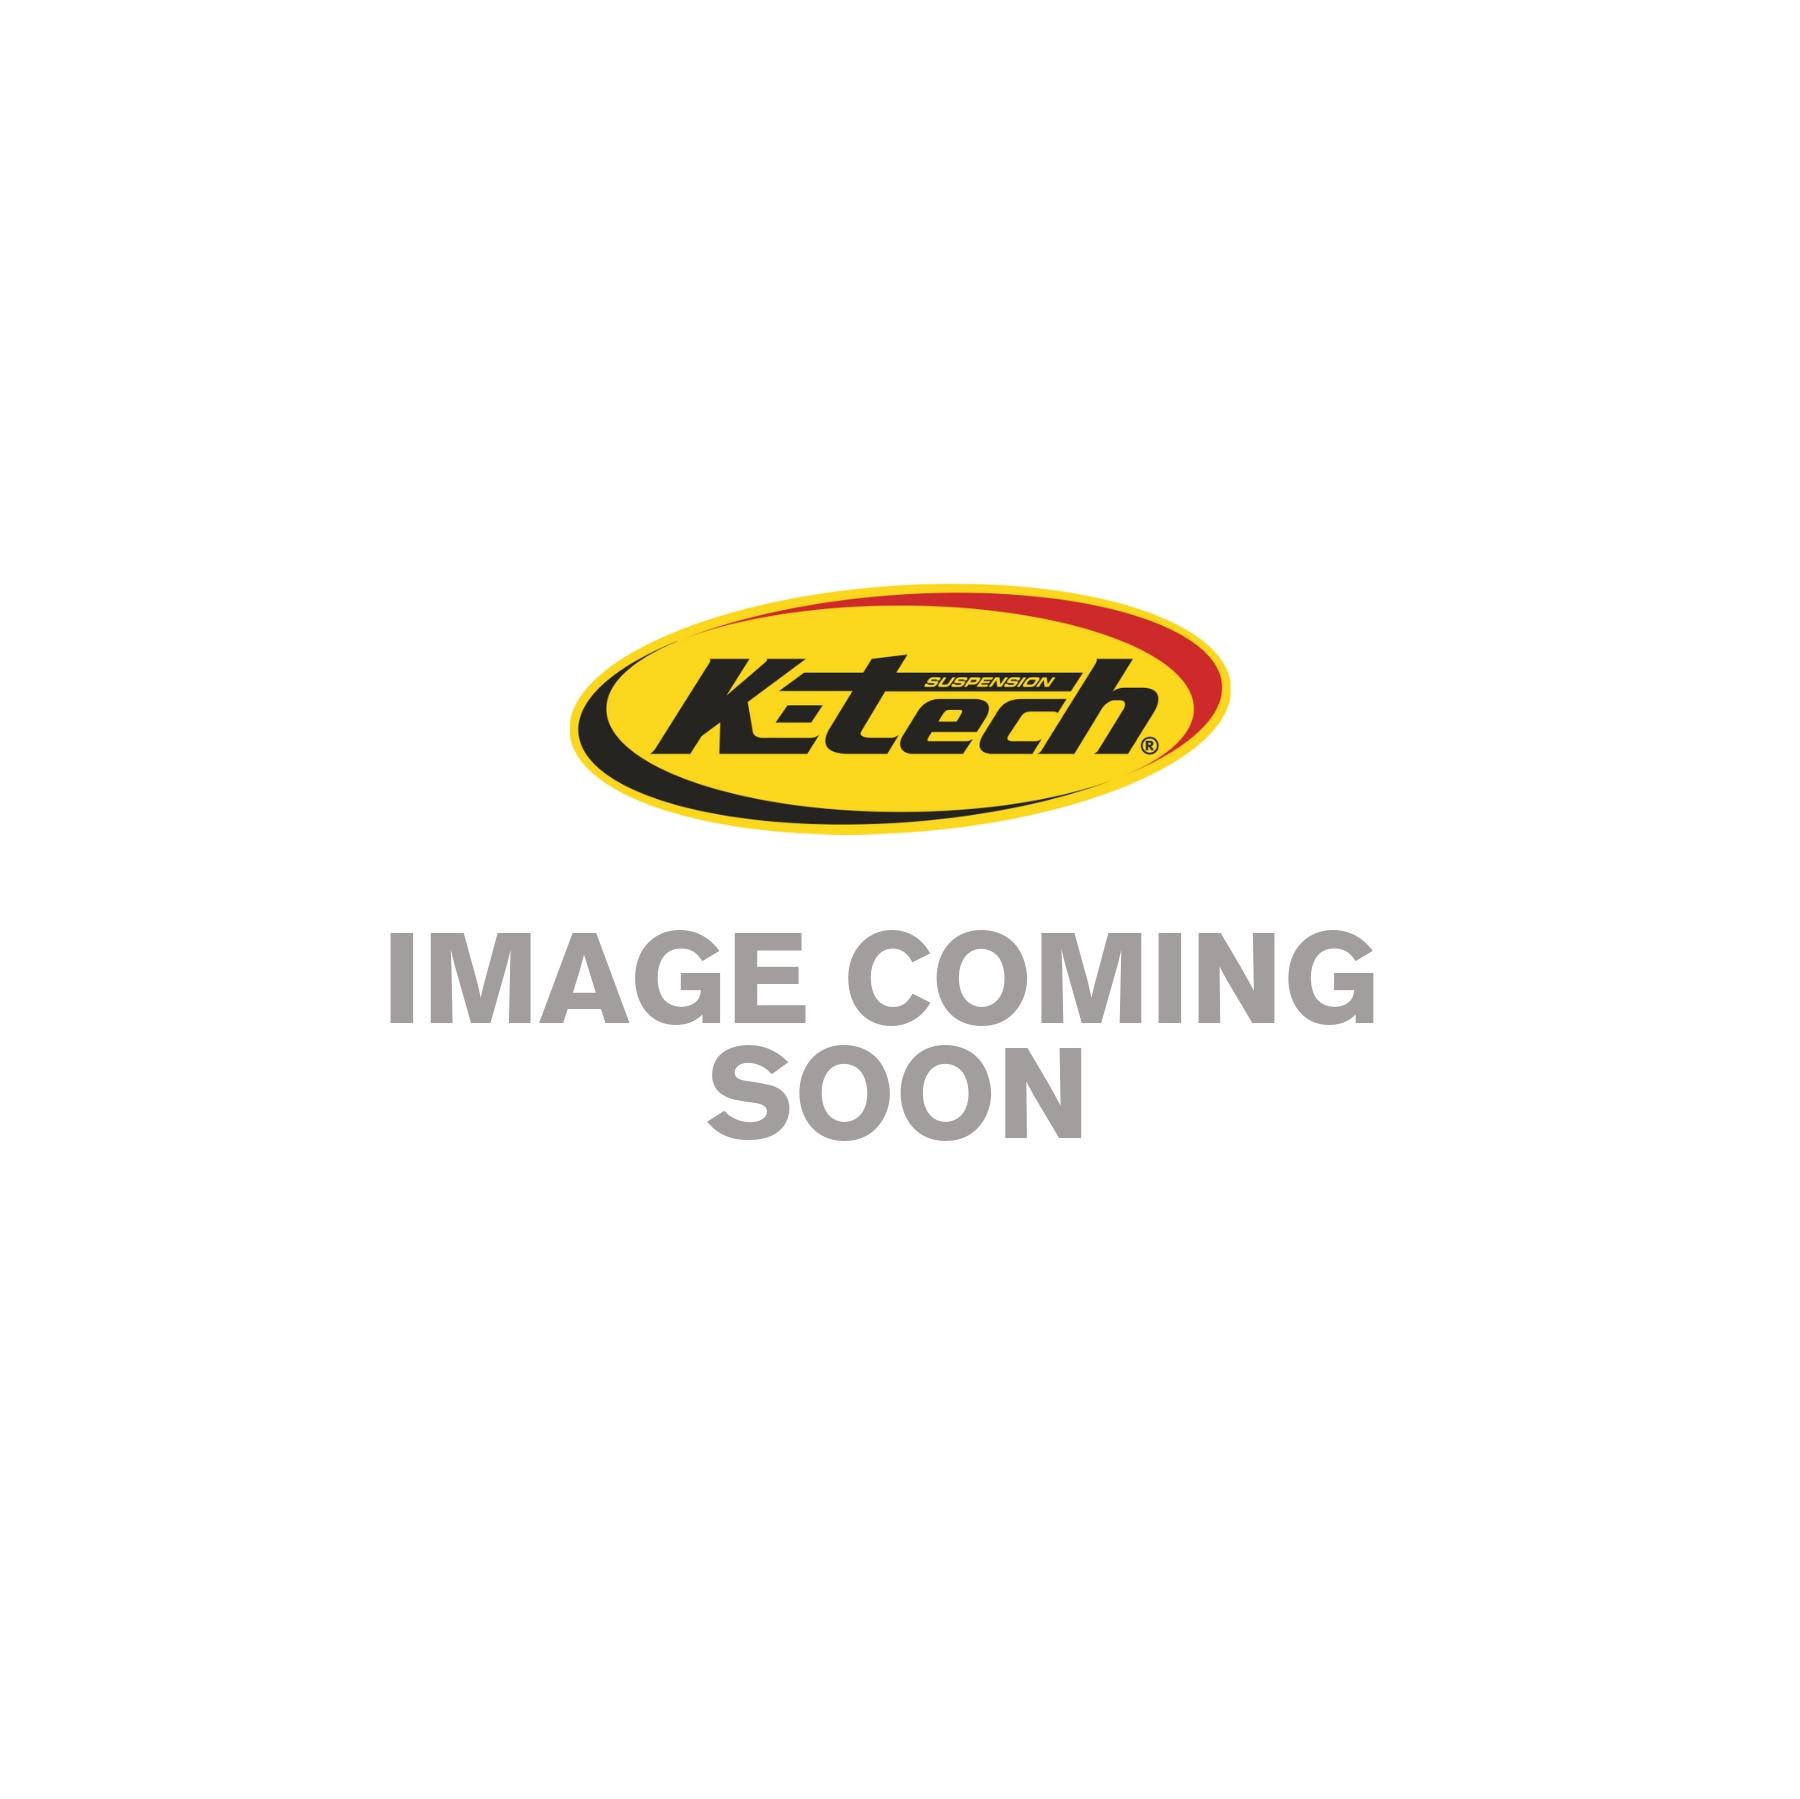 DDS Front Fork Cartridges Kawasaki ZX-10R 2011-2015 Showa BPF